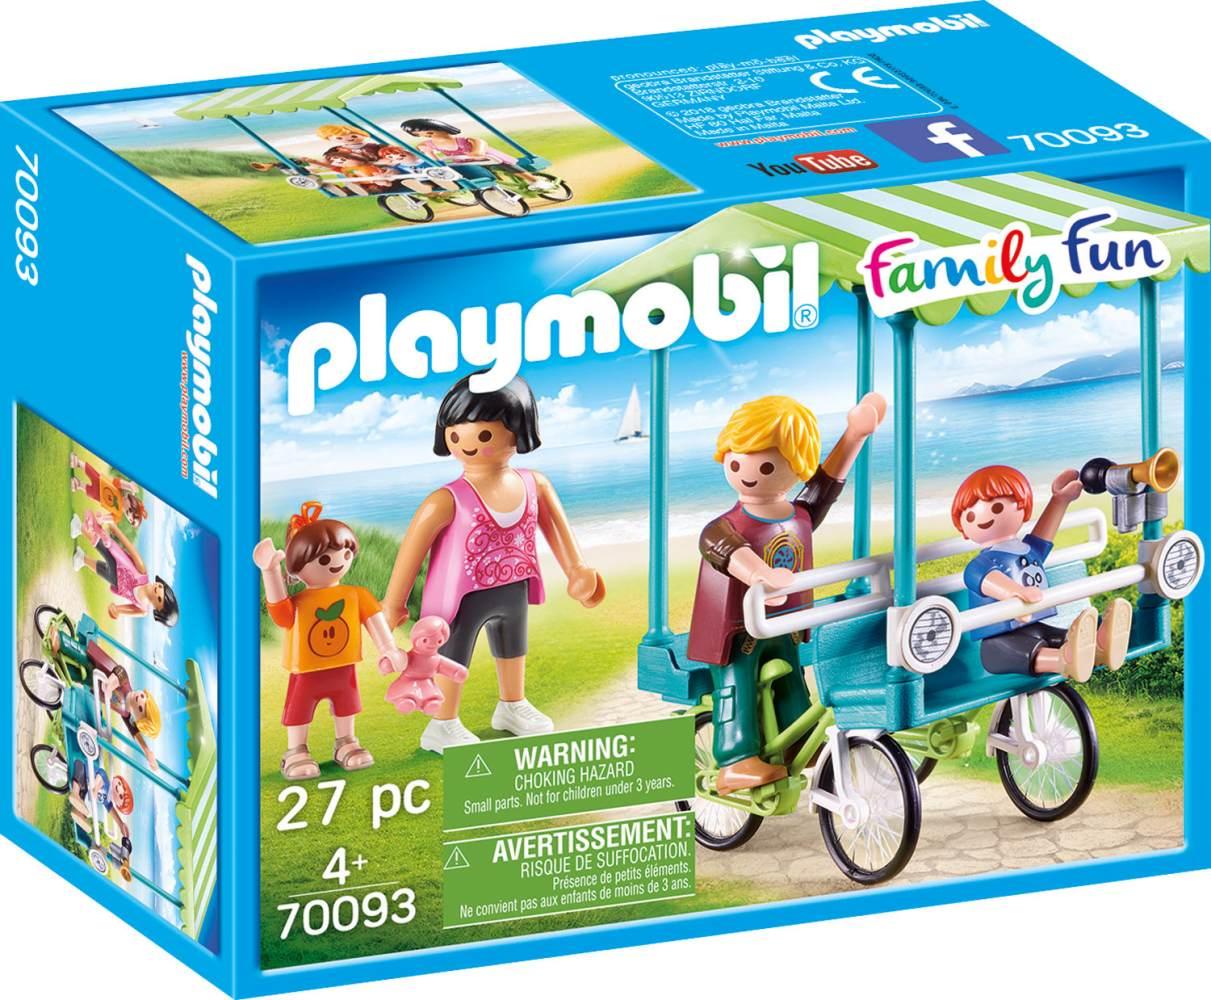 Playmobil Family Fun 70093 'Familien-Fahrrad', 27 Teile, ab 4 Jahren Bild 1